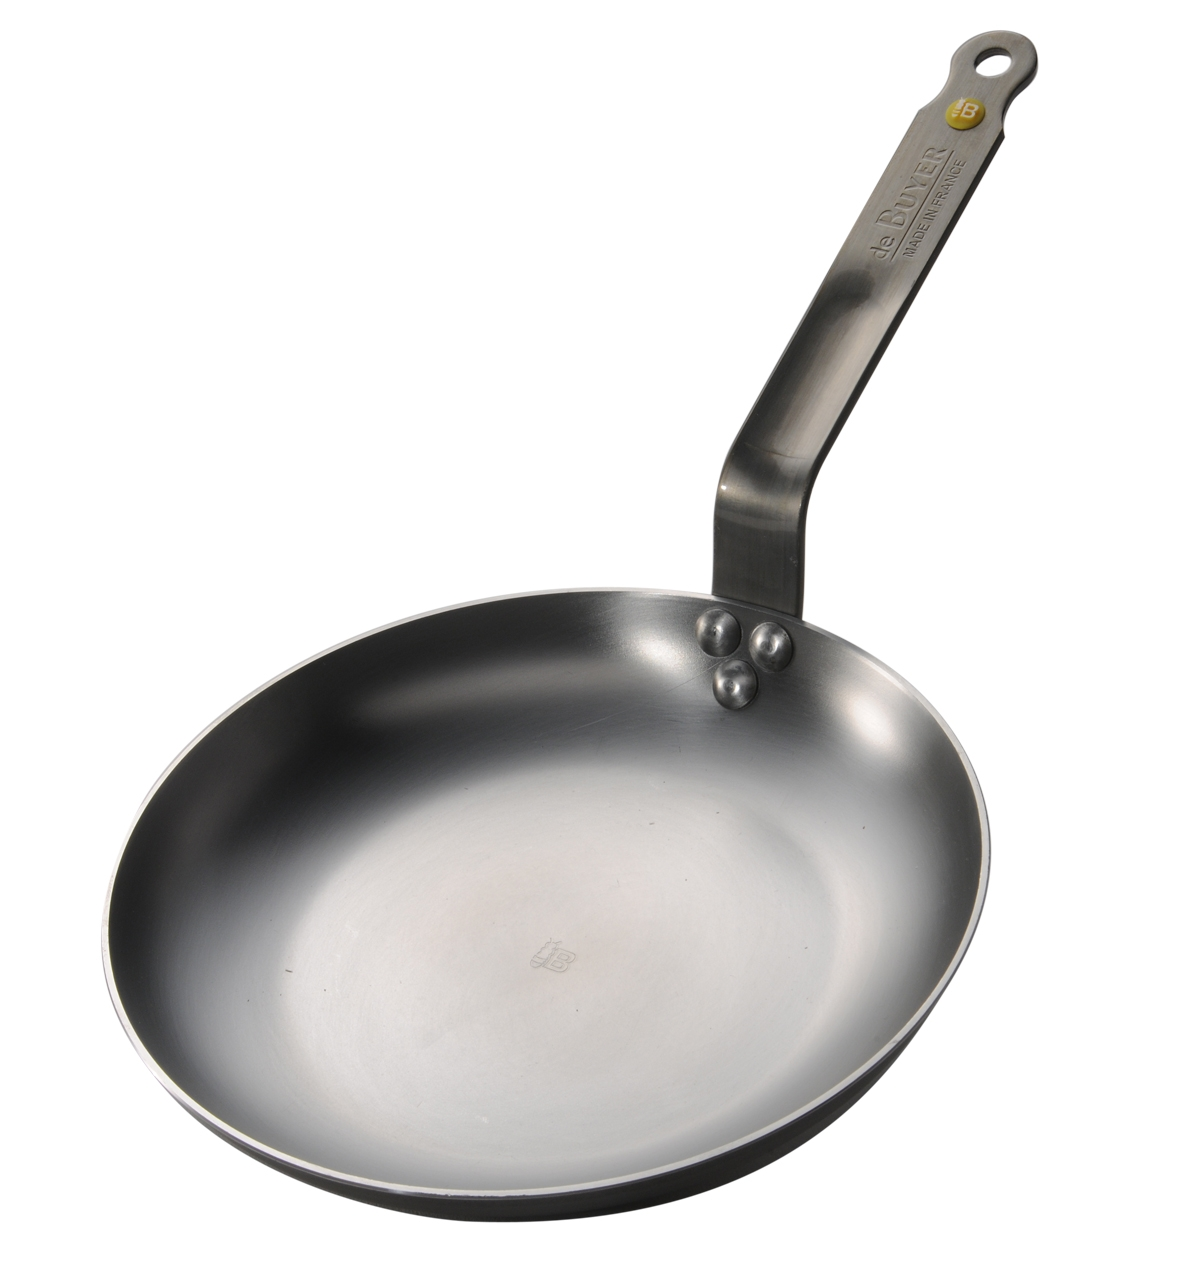 de Buyer Mineral B Element Iron Omelette Pan, 9.5\